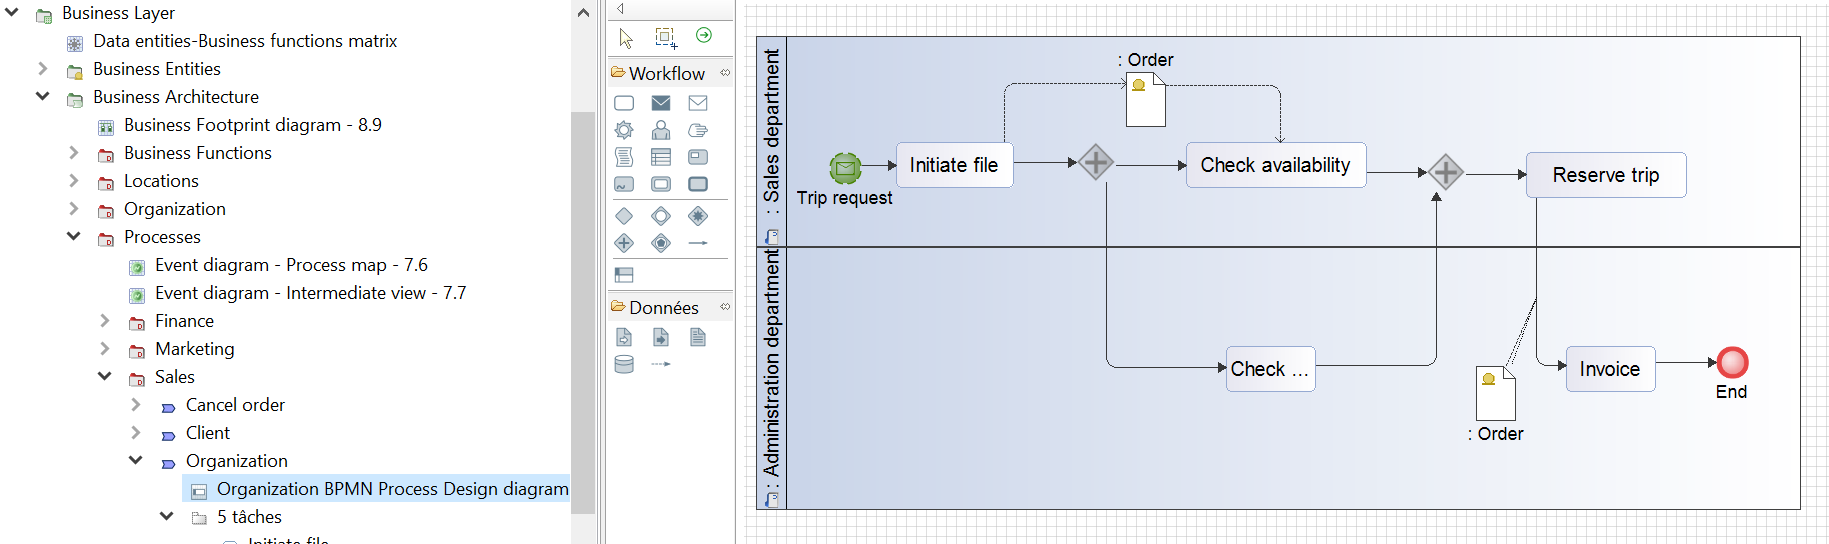 diagramme-de-processus-metier-BPMN-TOGAF.PNG